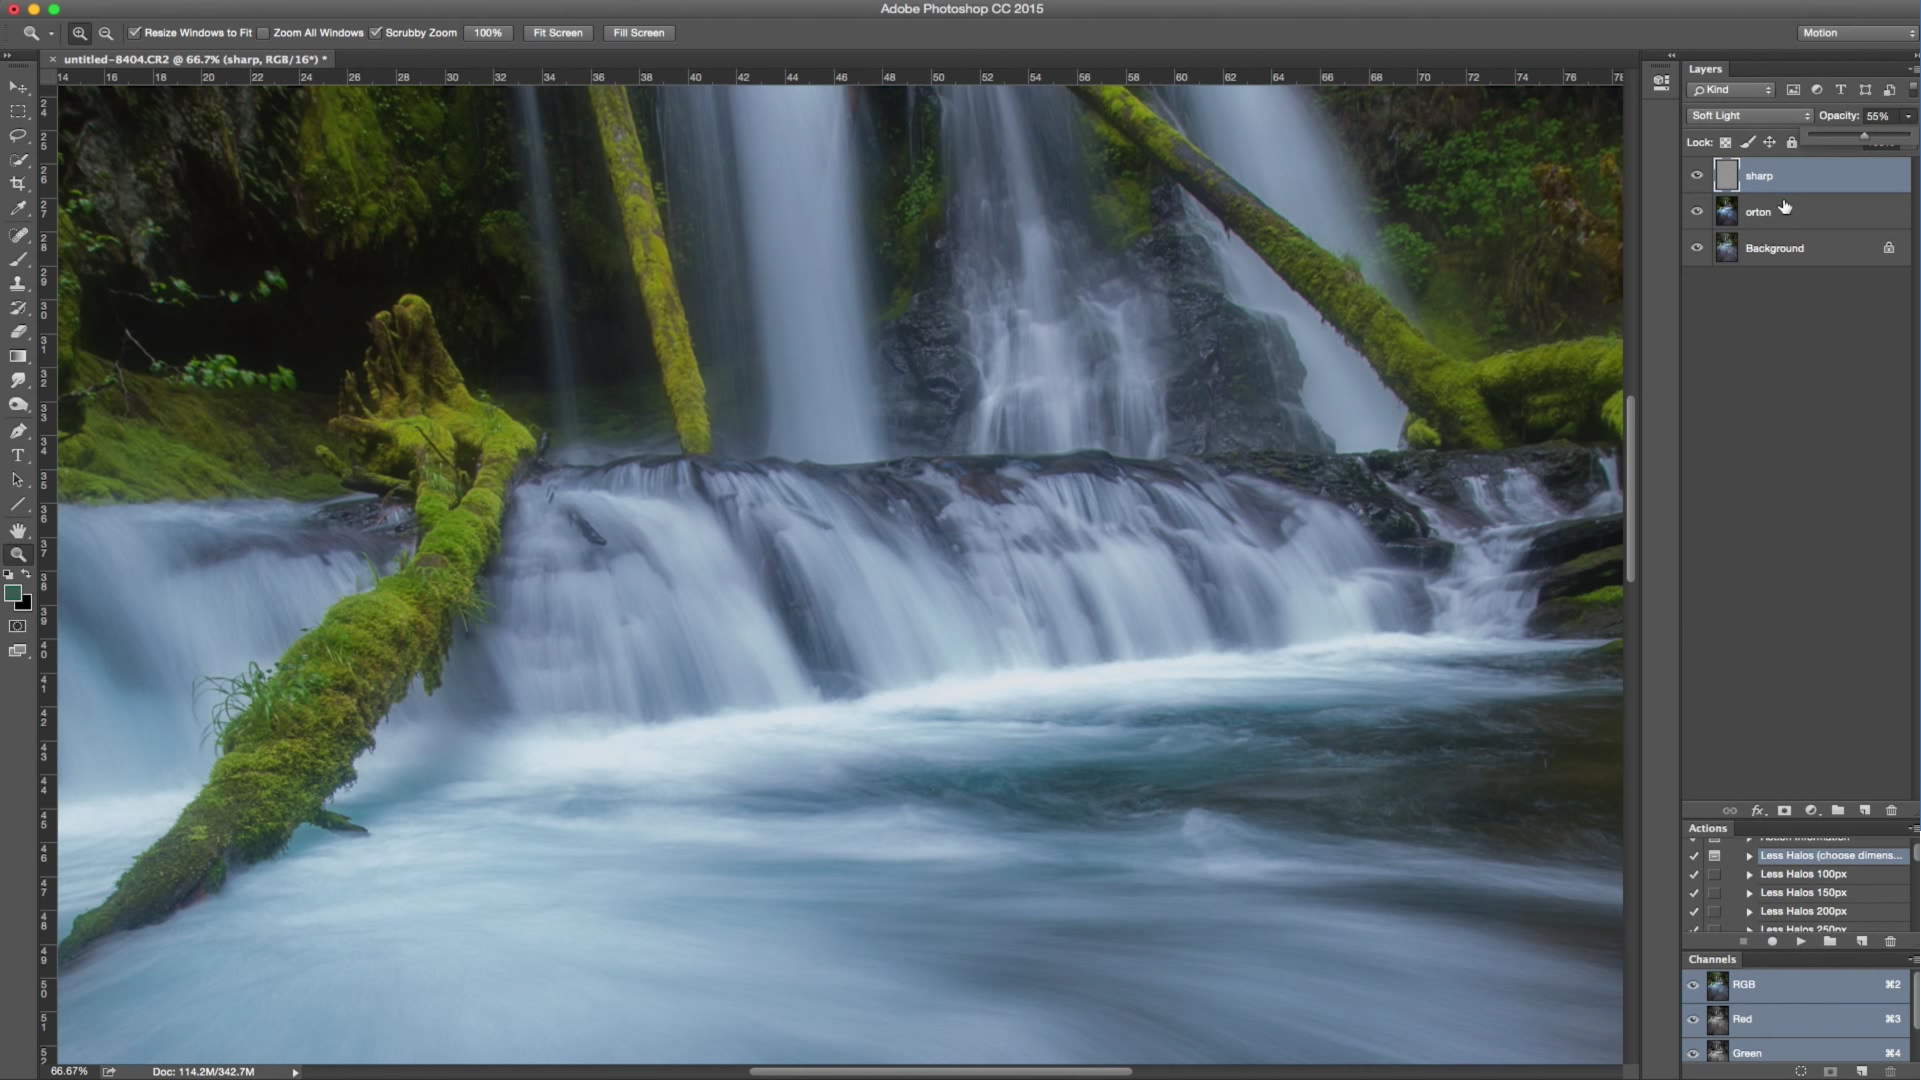 Landscape Photography Photoshop Tutorial, Orton Effect